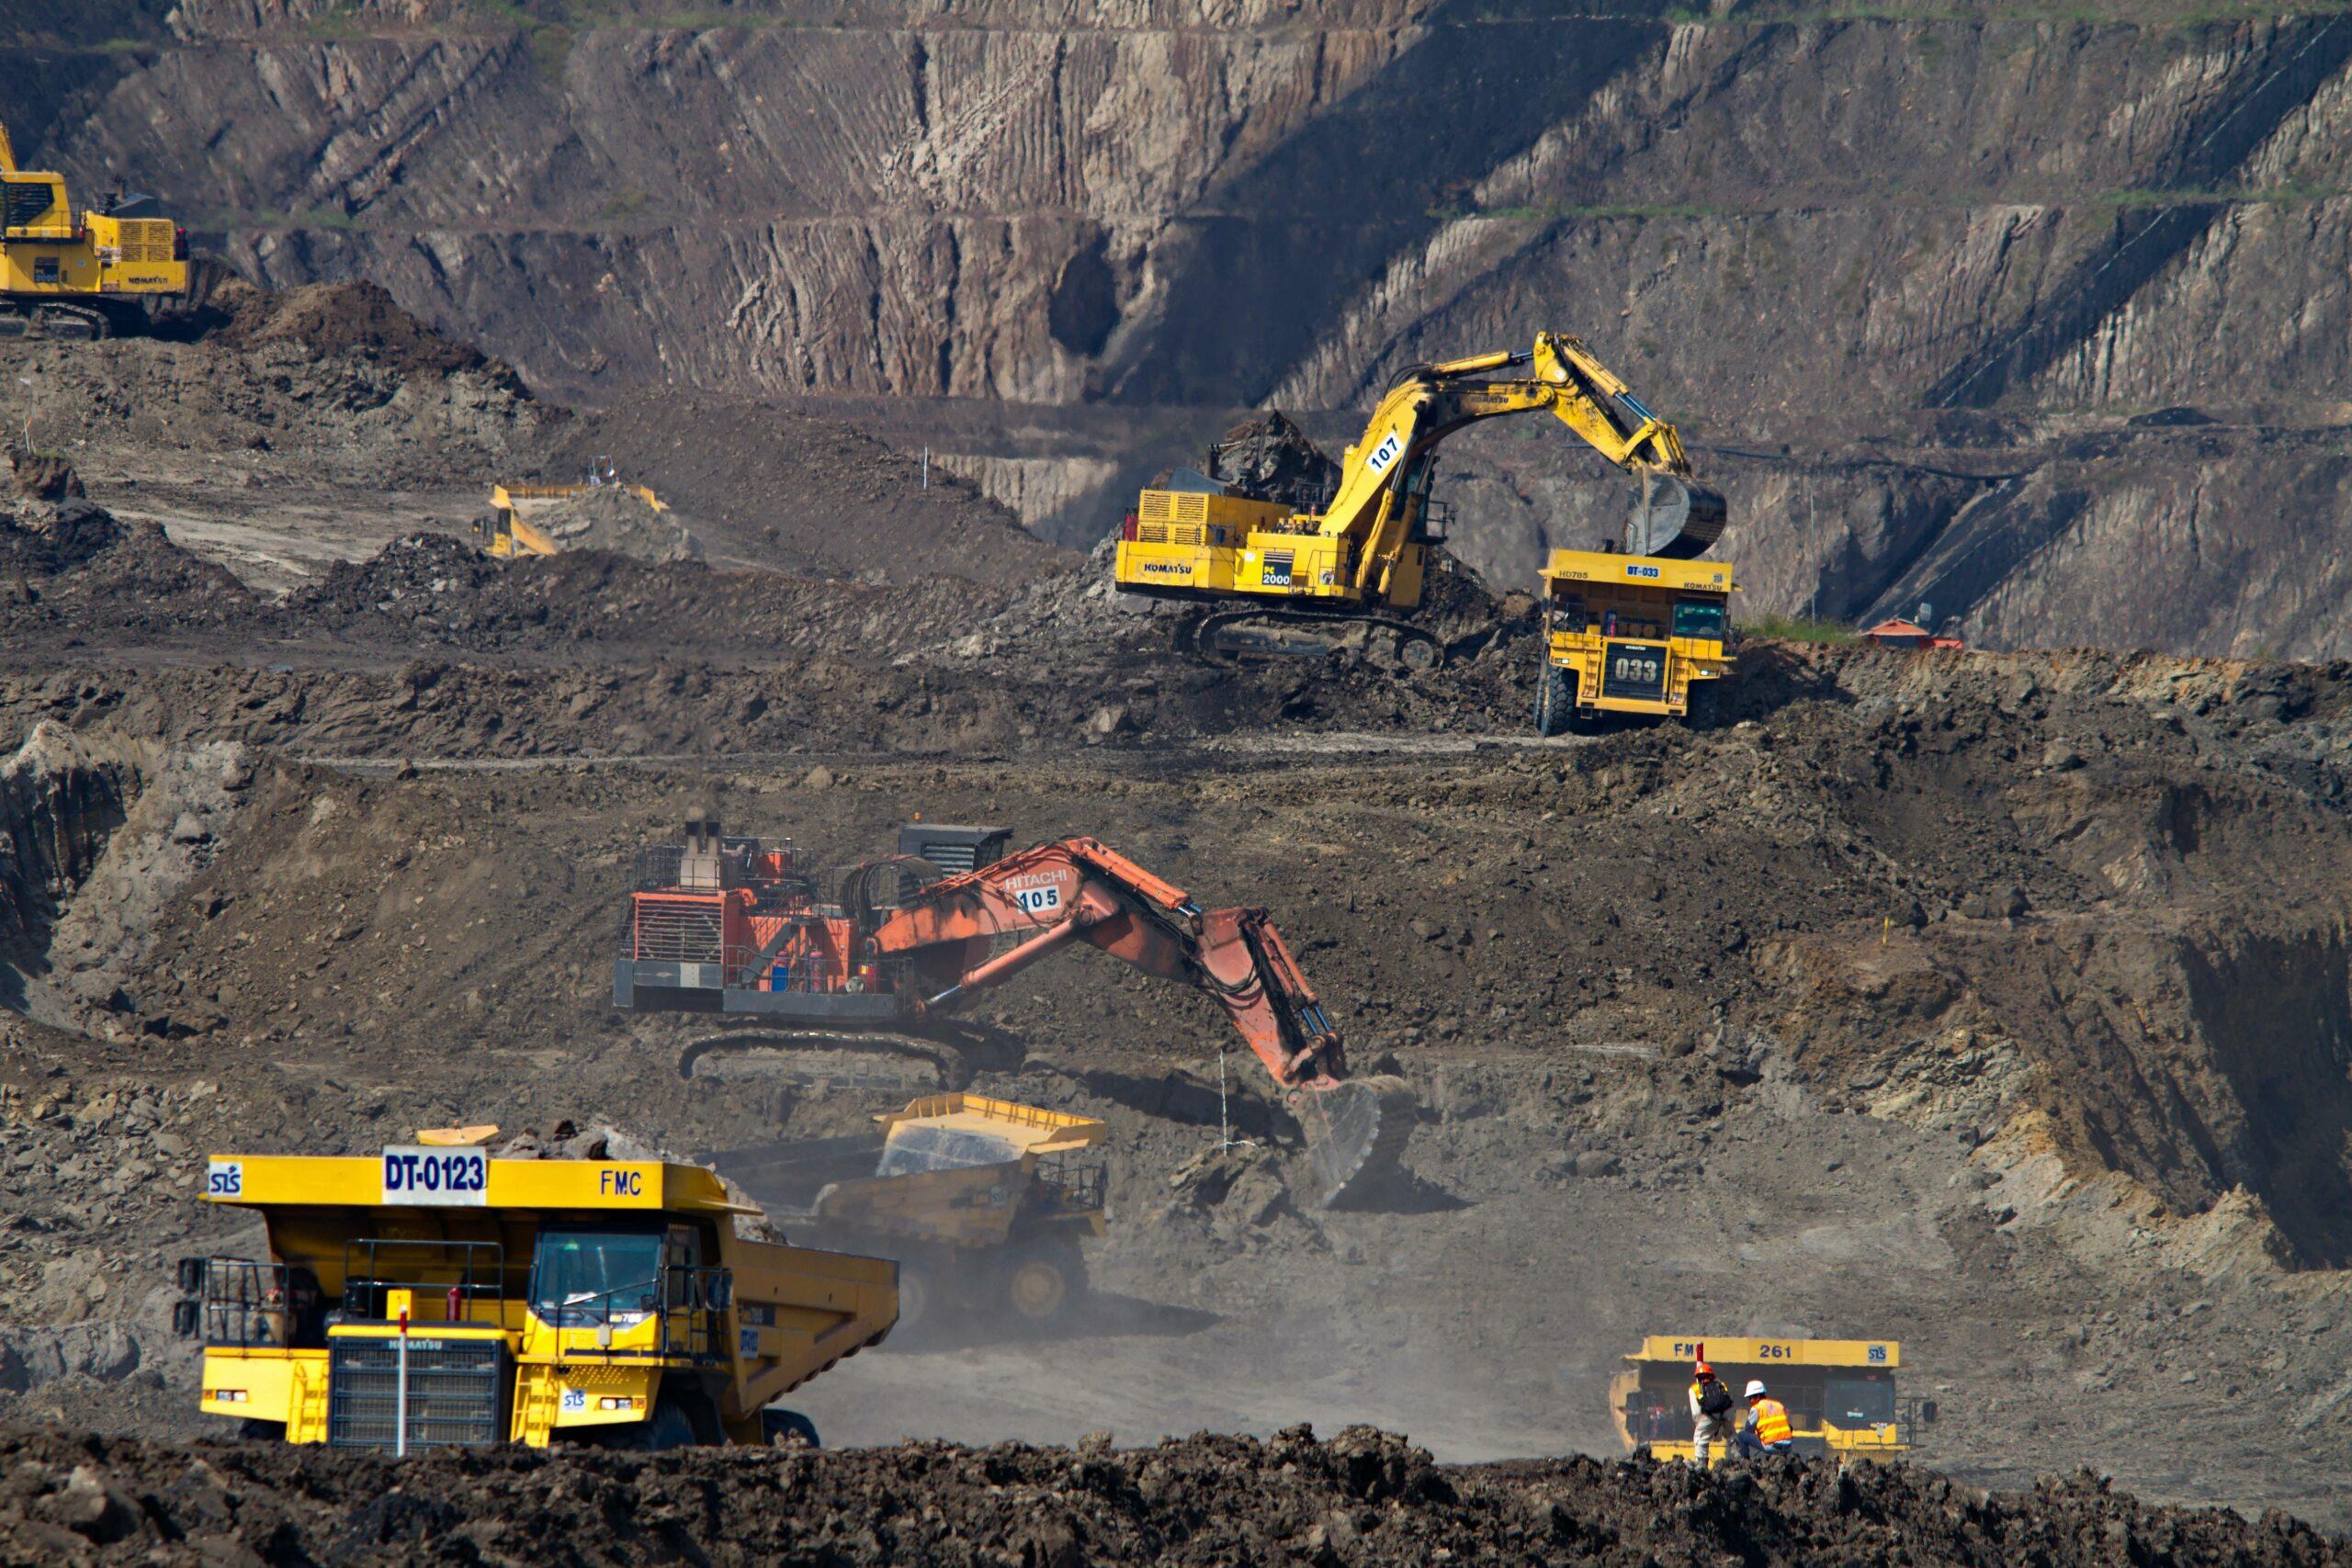 Mines de charbon, Indonésie / Coal Mines, Indonesia